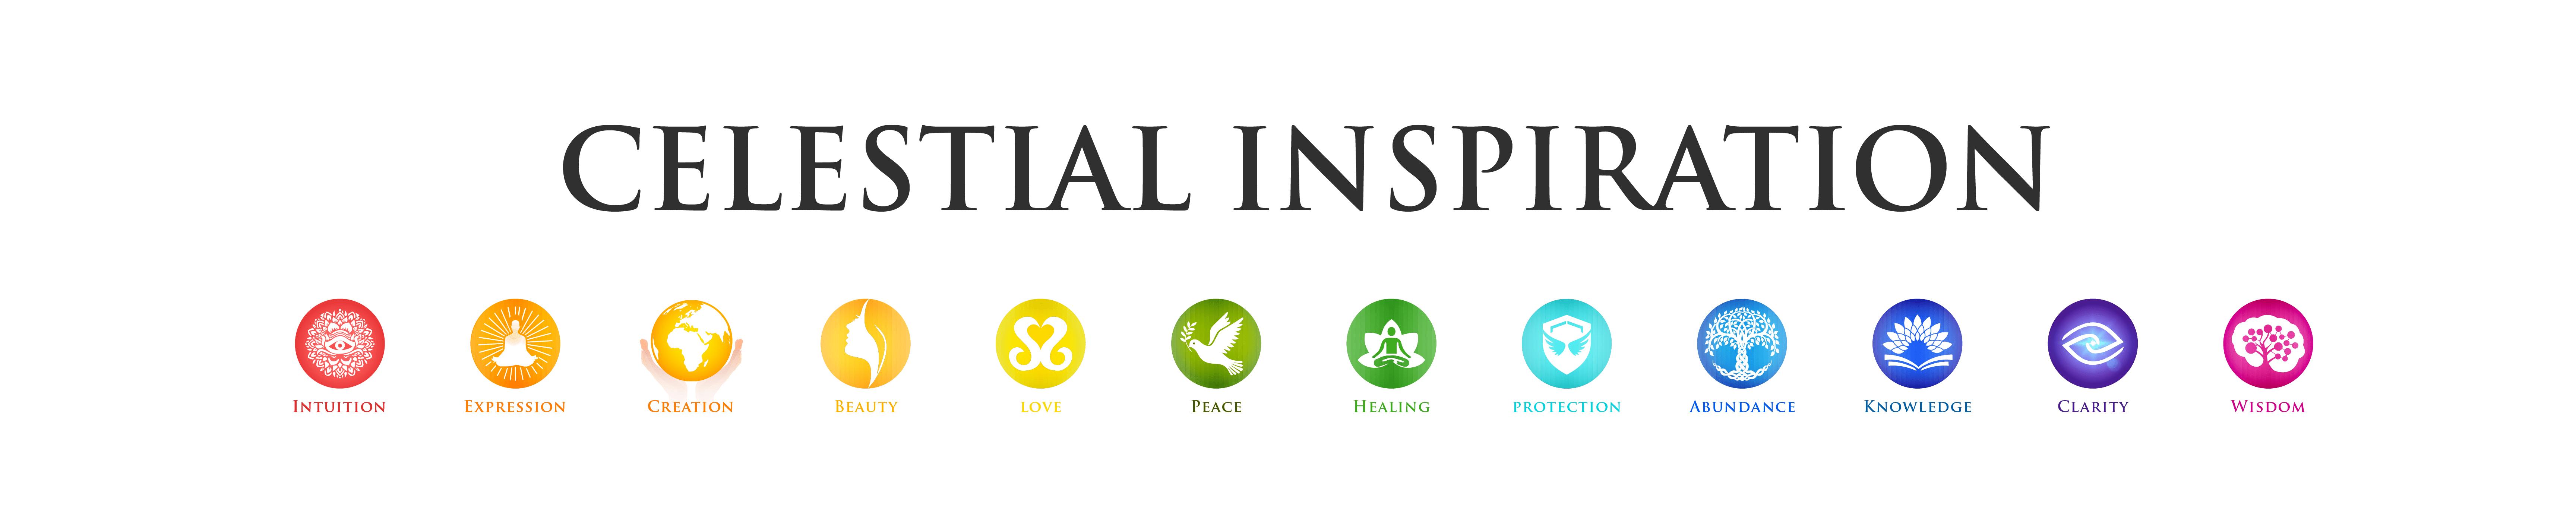 Celestial Inspiration